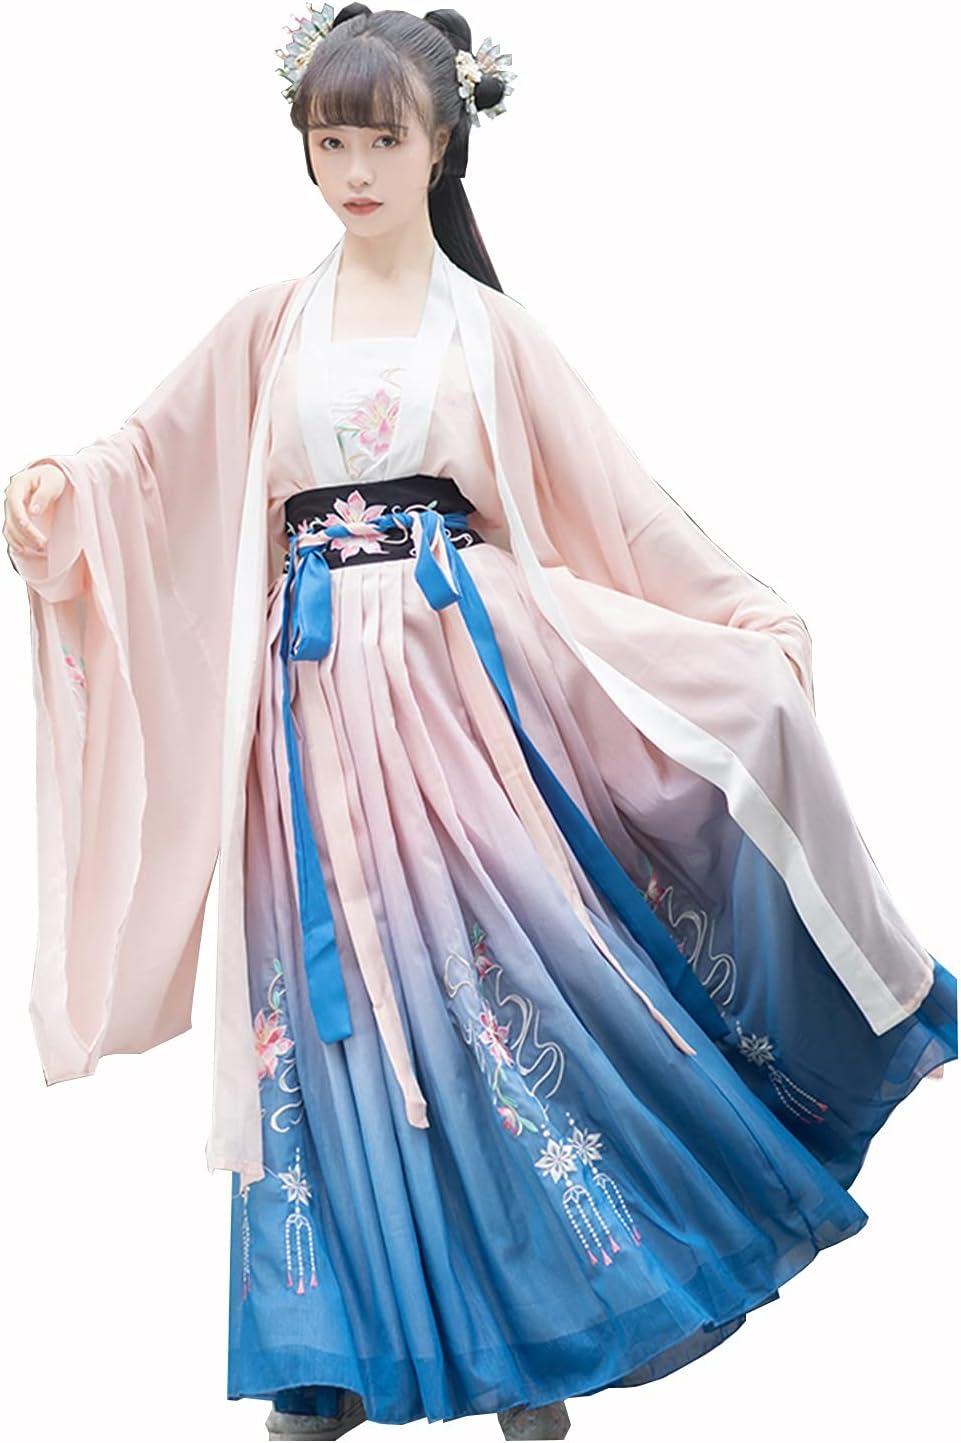 YANLINA Hanfu Women's Traditional St Complete Free Shipping San Antonio Mall Ancient Skirt Chinese